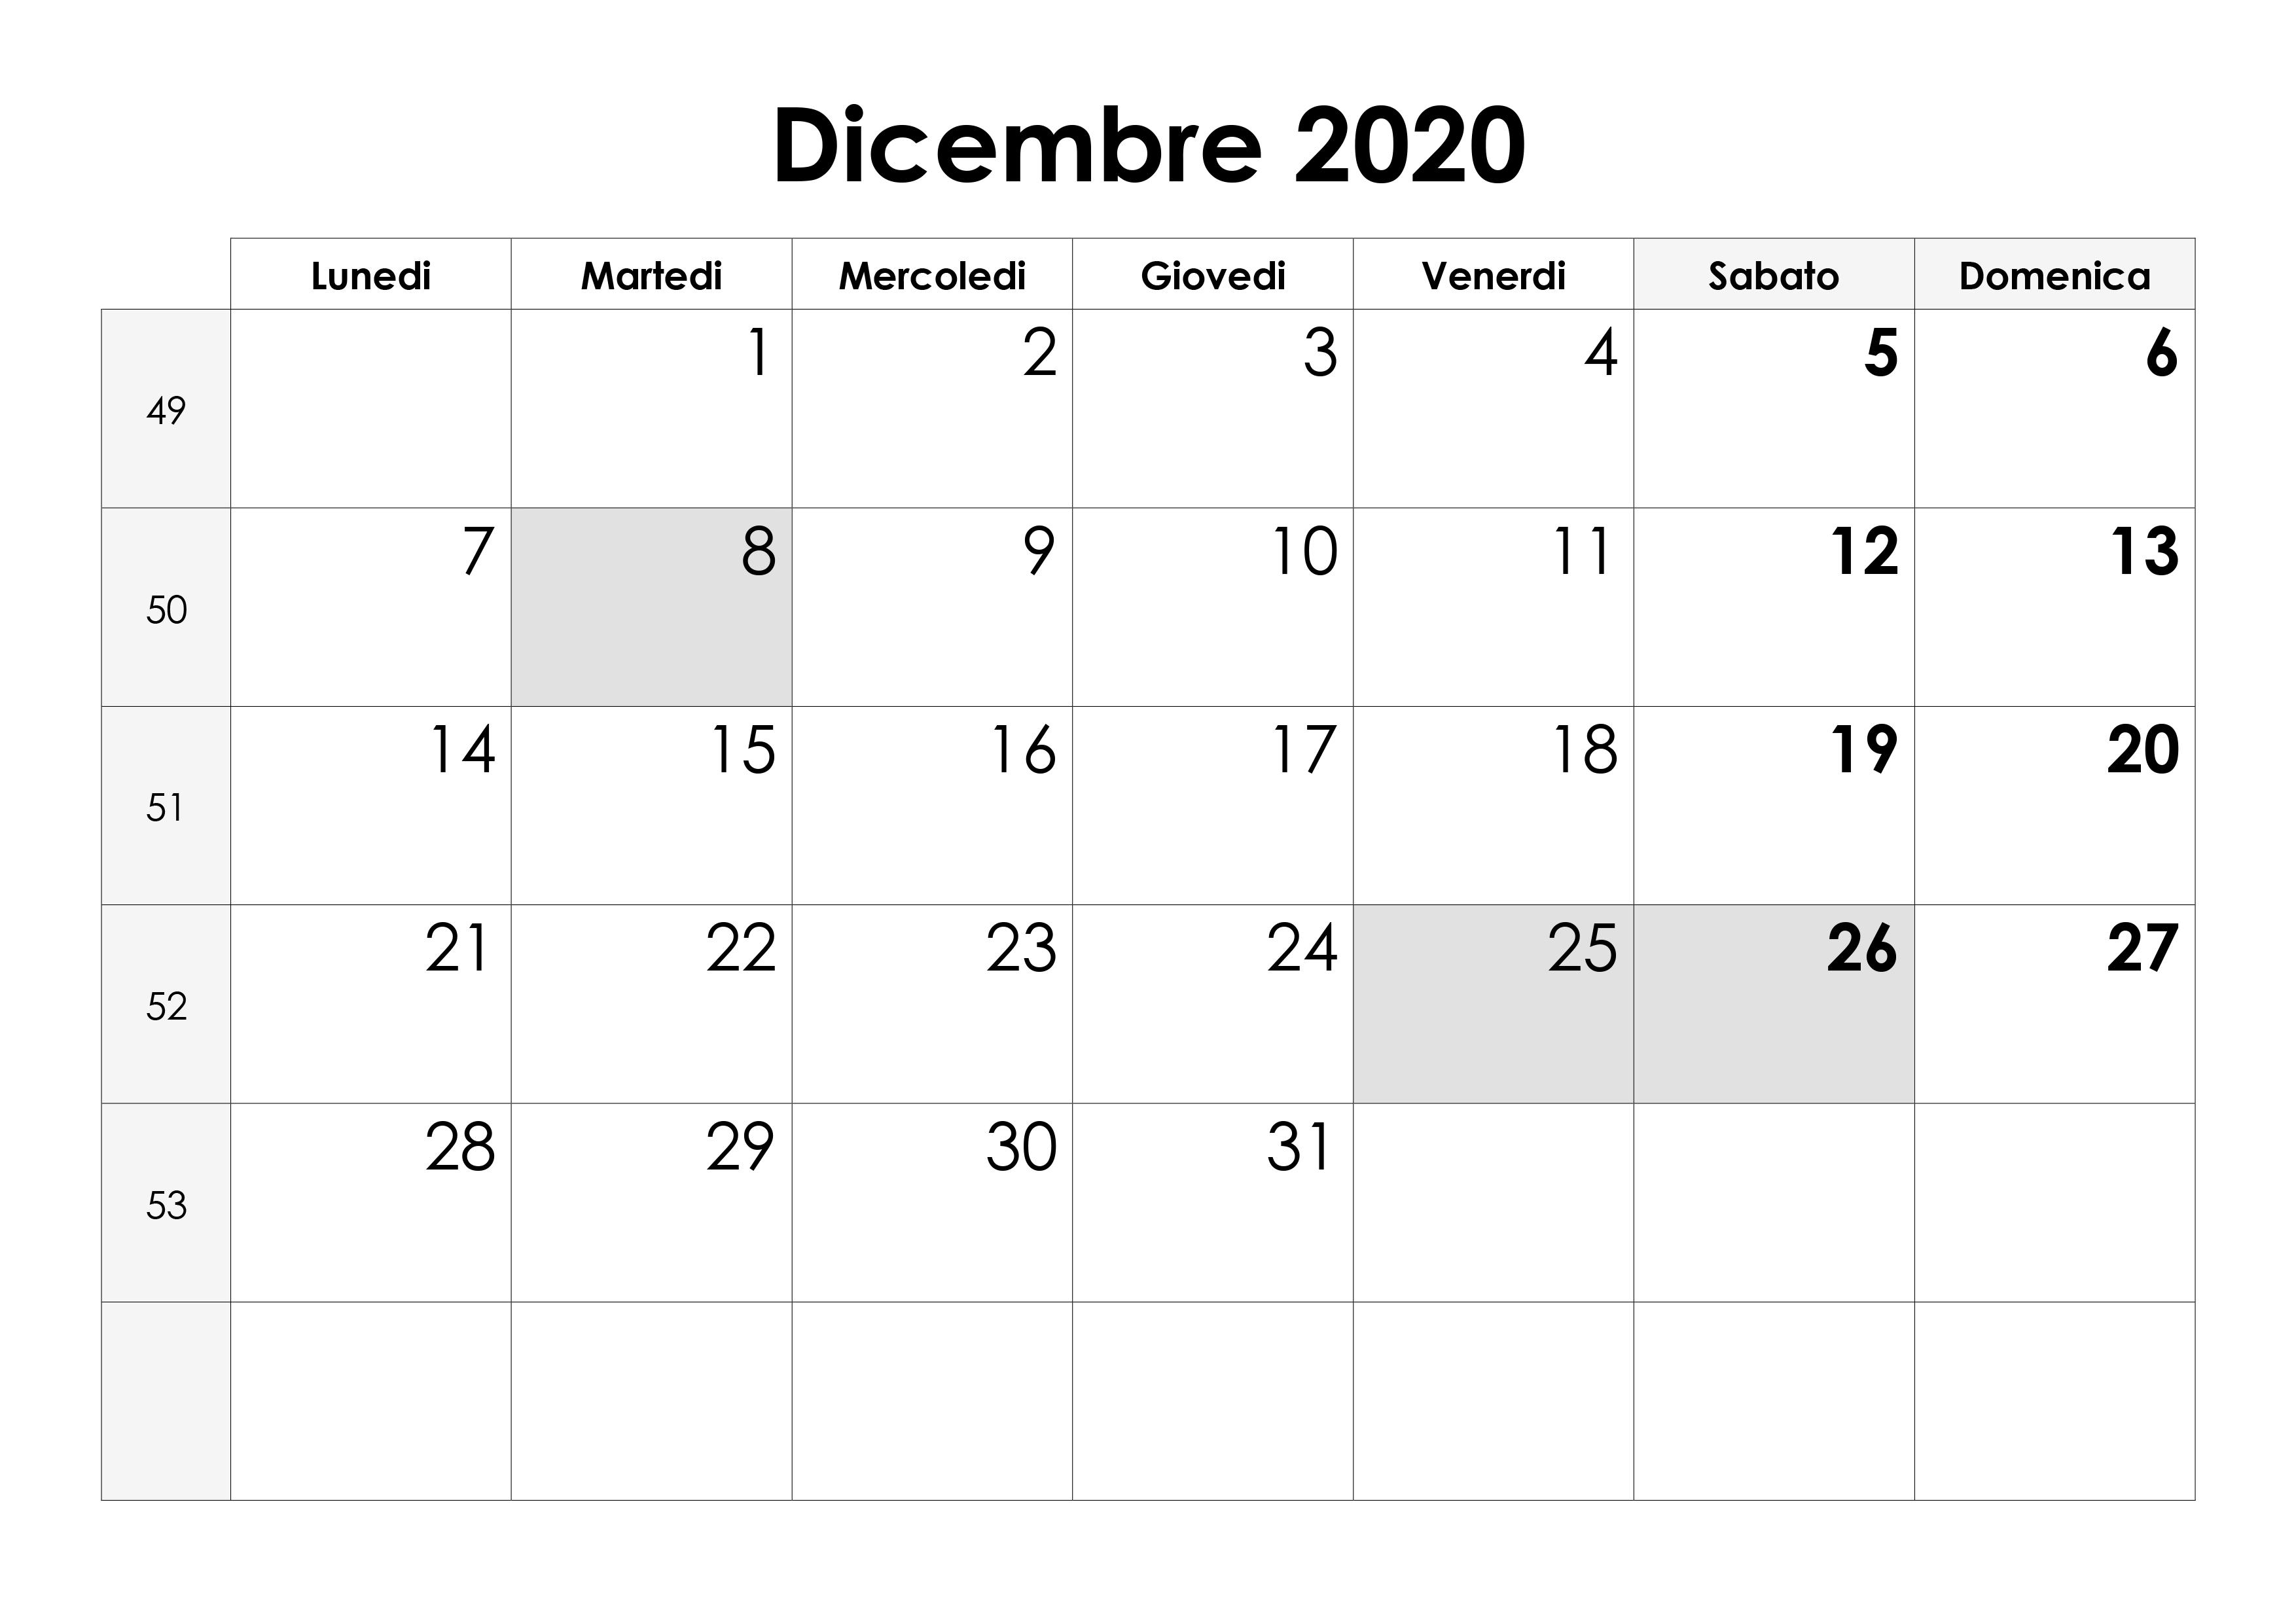 Calendario Dicembre 2020 Da Stampare Pdf.Calendario Dicembre 2020 Calendario Su